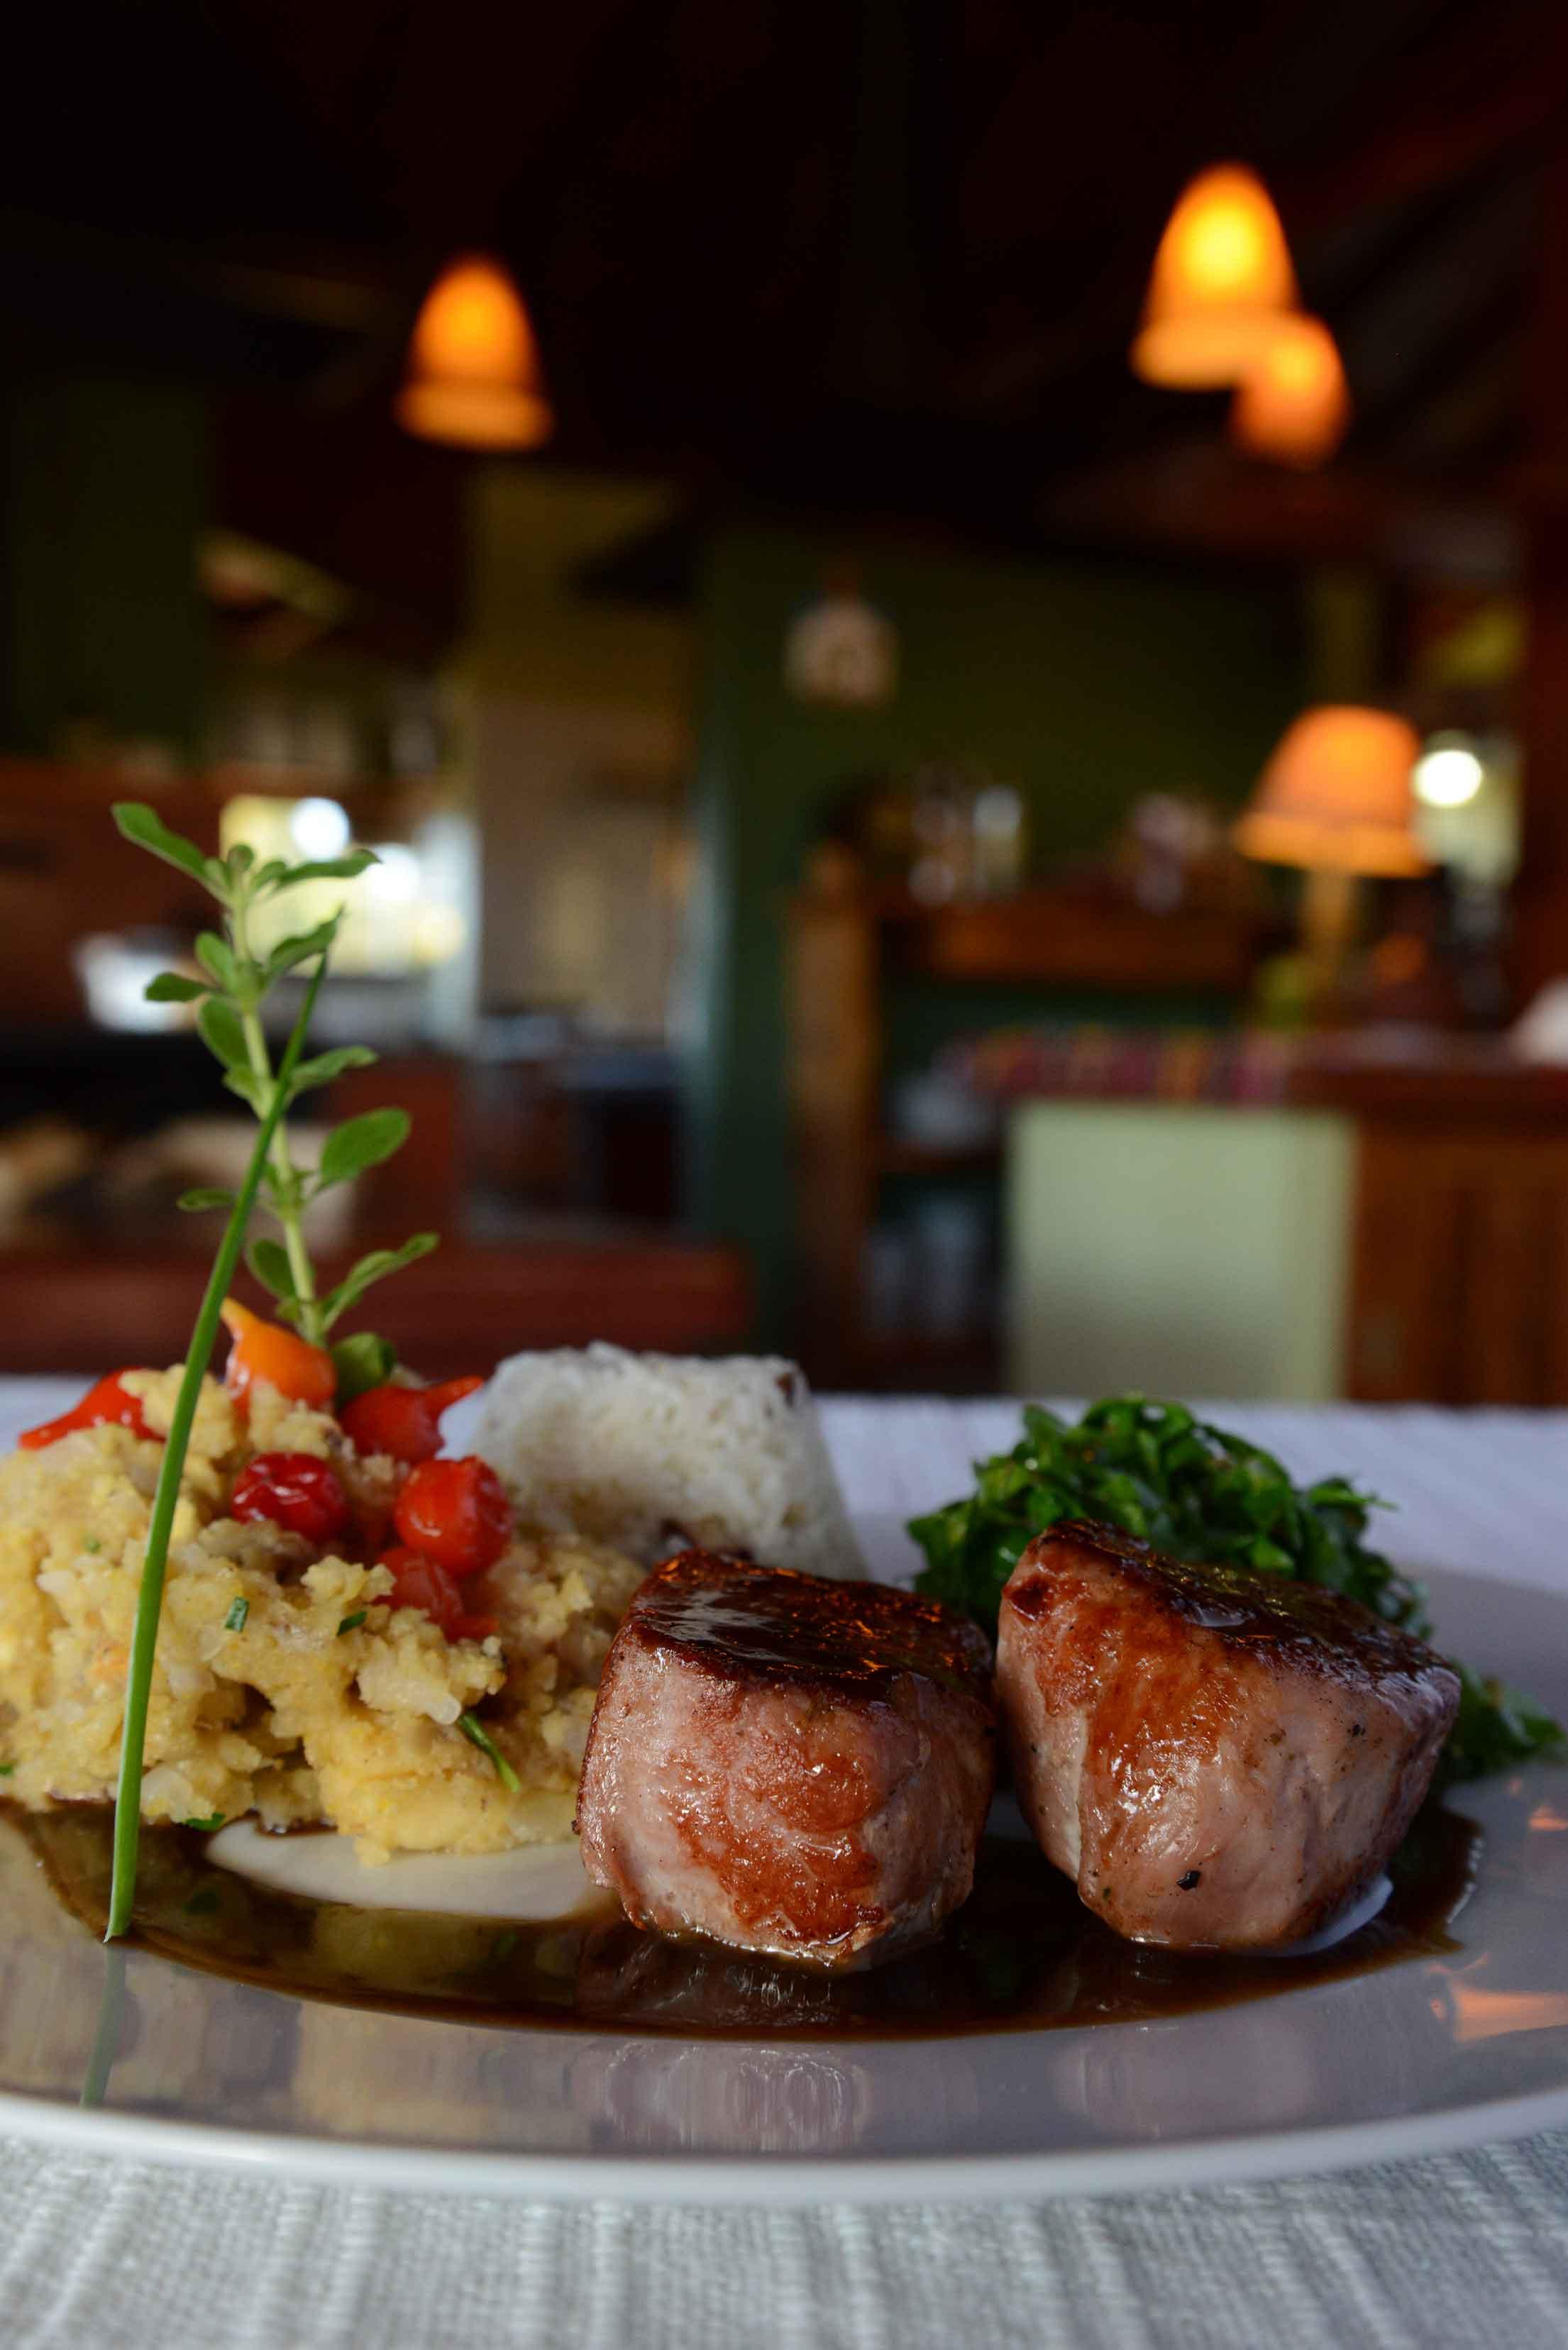 Goncalves-Gastronomia-Restaurante-Saua-Bicho-do-Mato-Roberto-Torrubia-bx